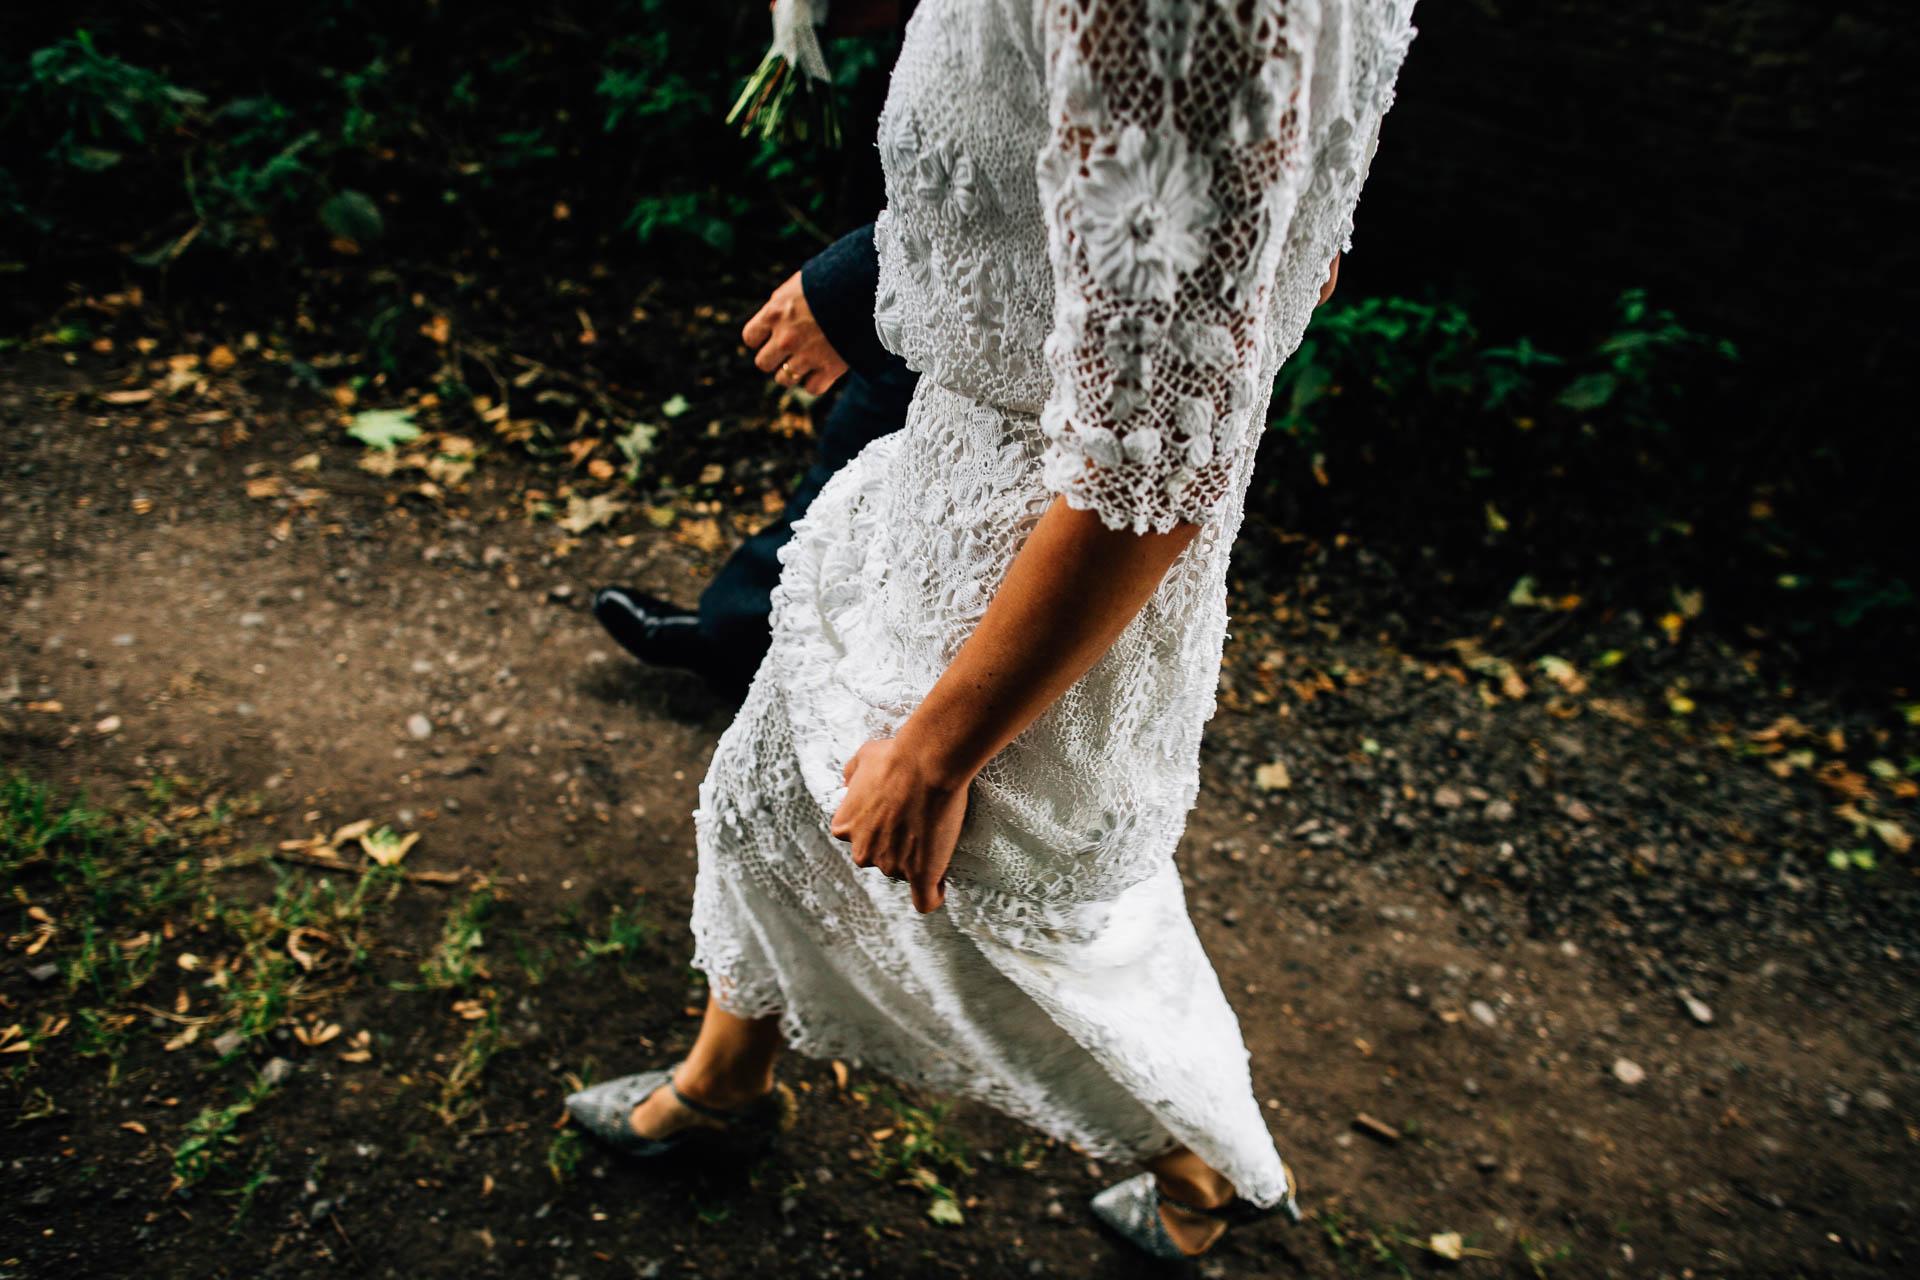 winterbourne-medieval-barn-wedding-photography-emma-andrew-73